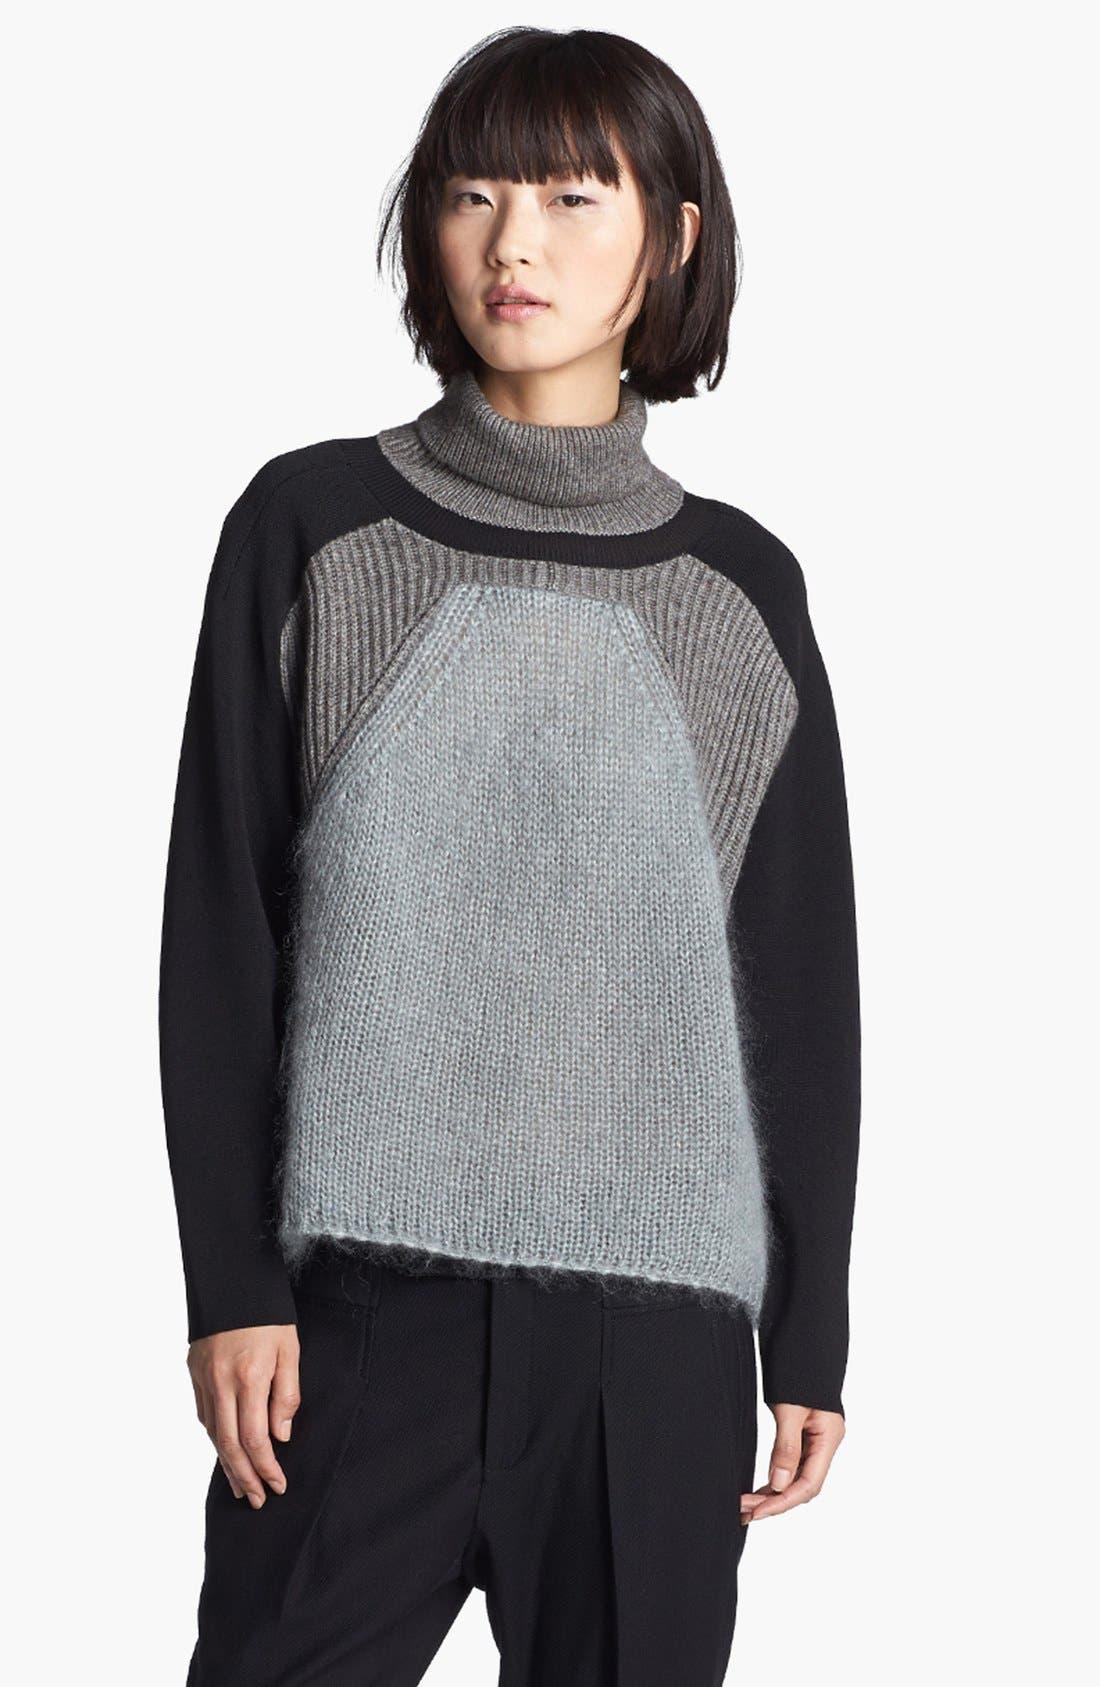 Alternate Image 1 Selected - Helmut Lang Colorblock Turtleneck Sweater